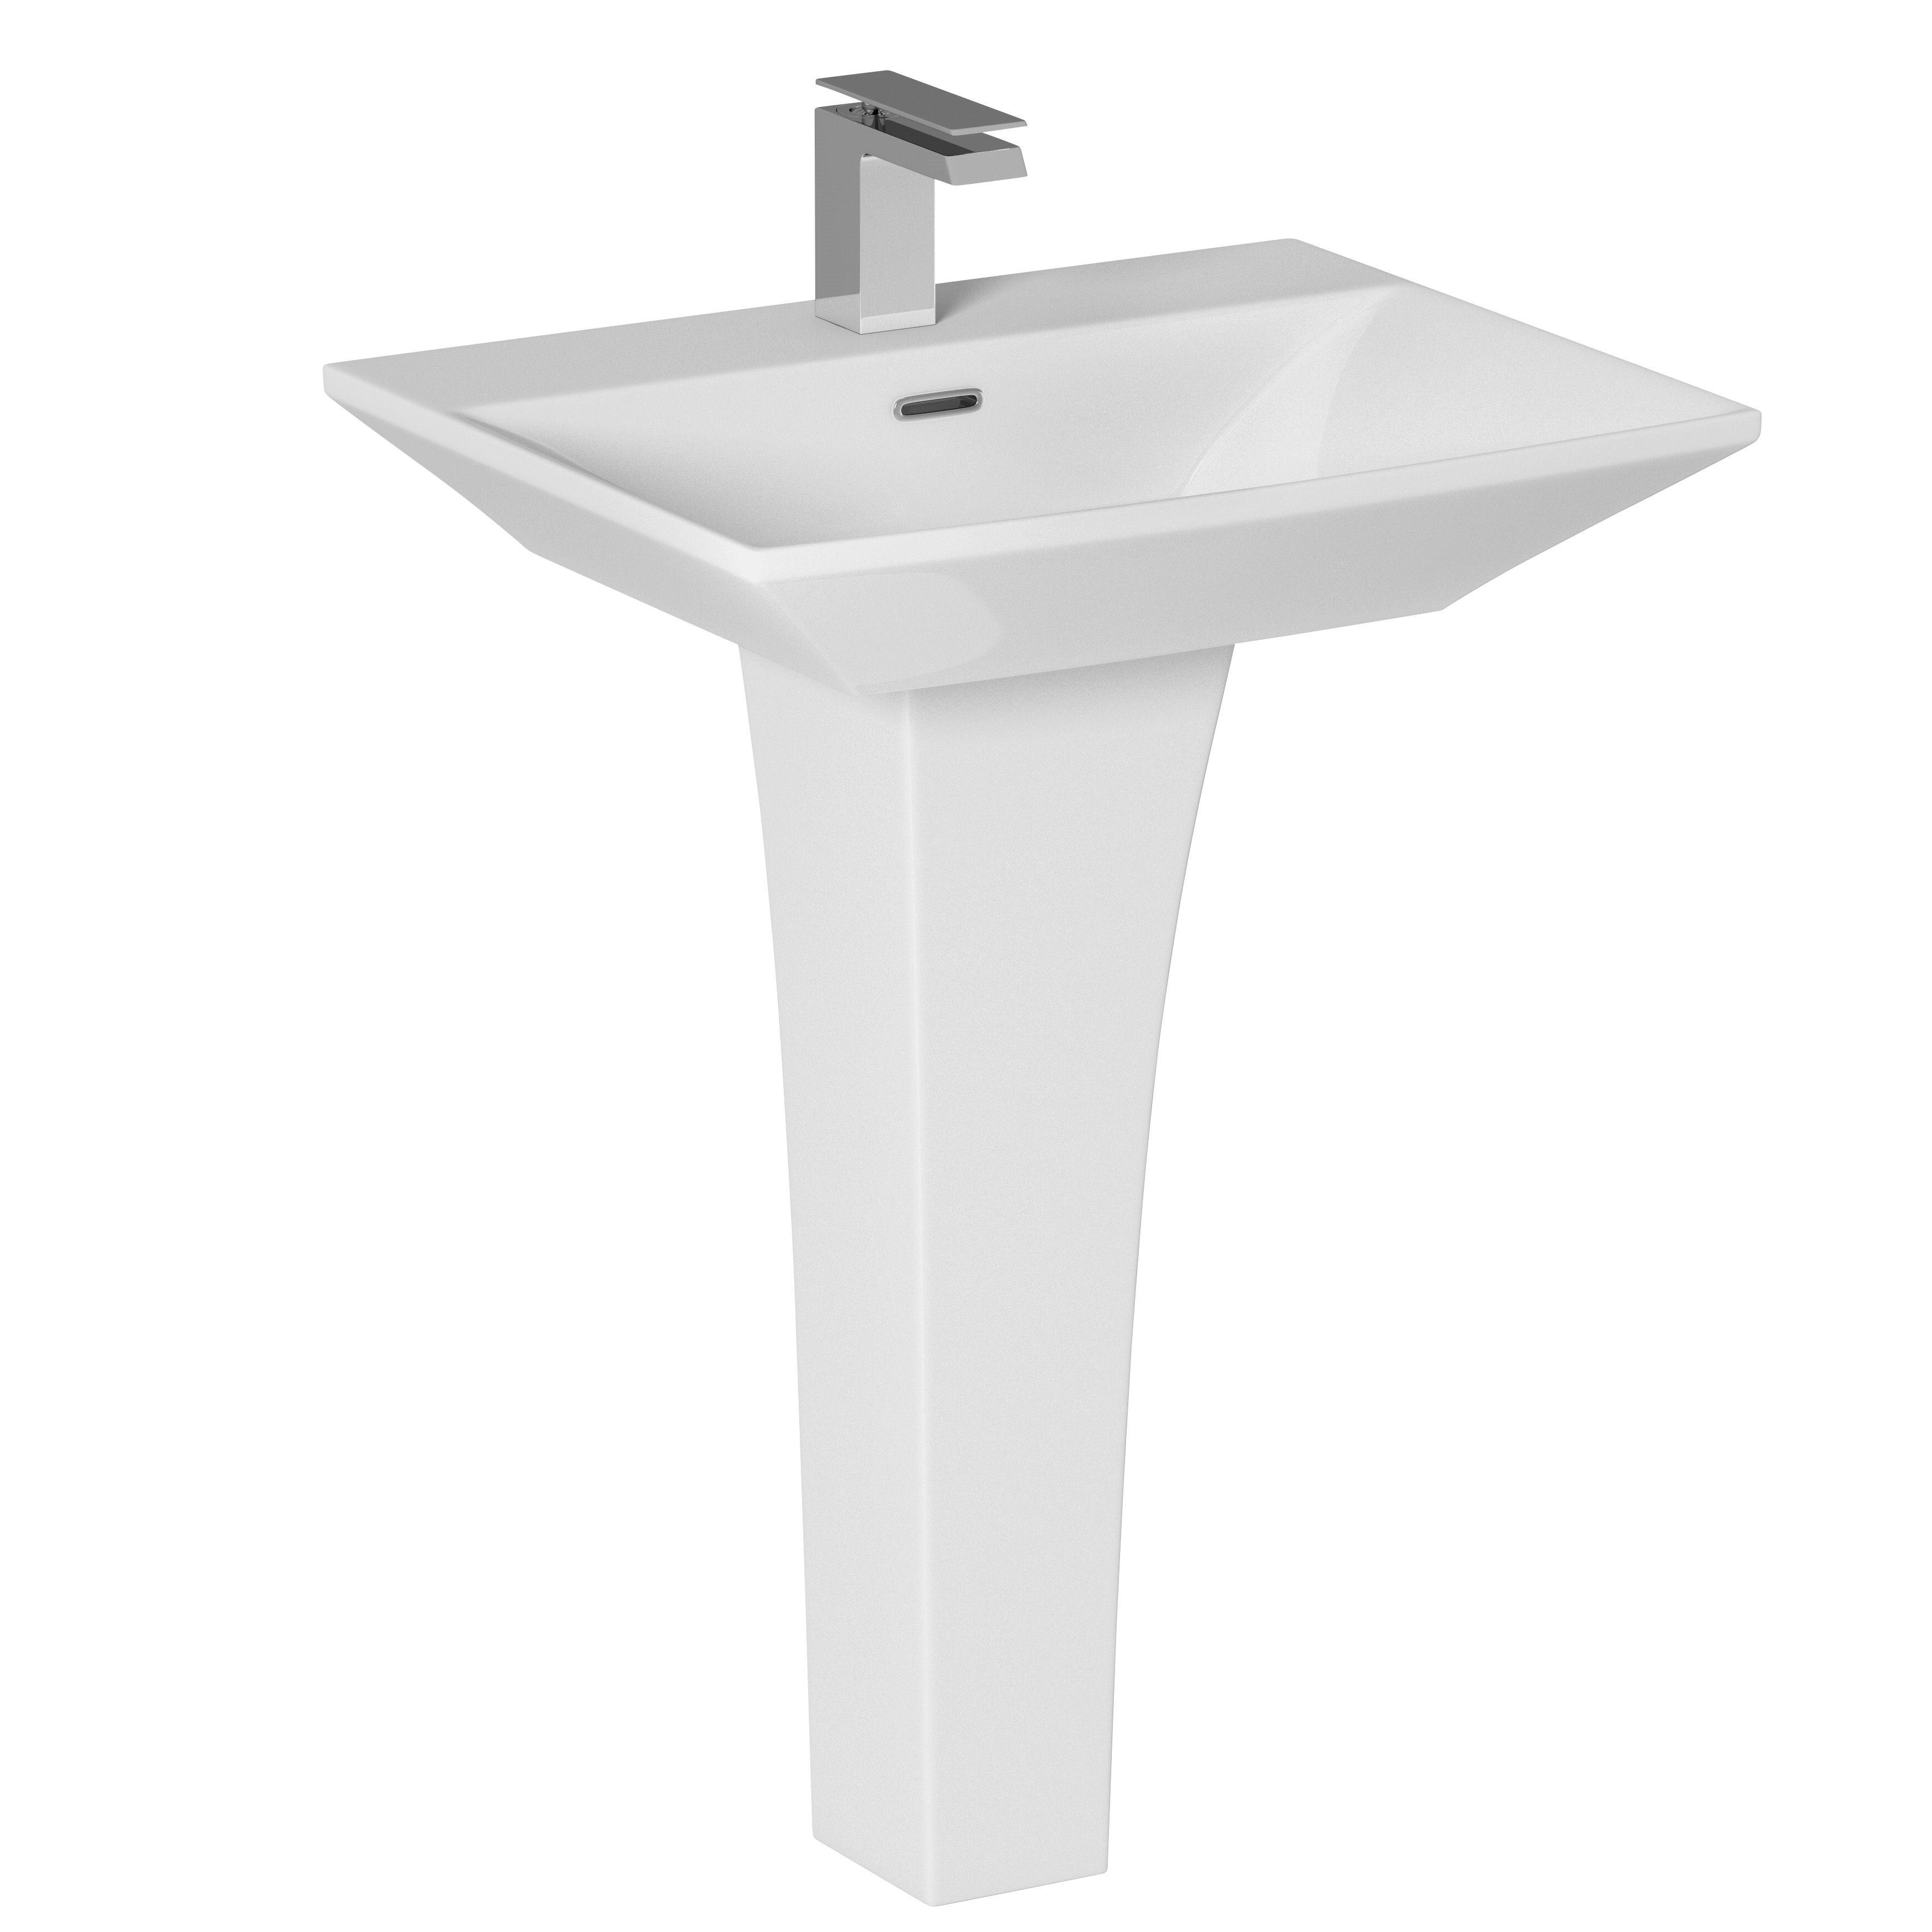 Bathroom Sinks B&Q Ireland cooke & lewis carapelle full pedestal basin | departments | diy at b&q